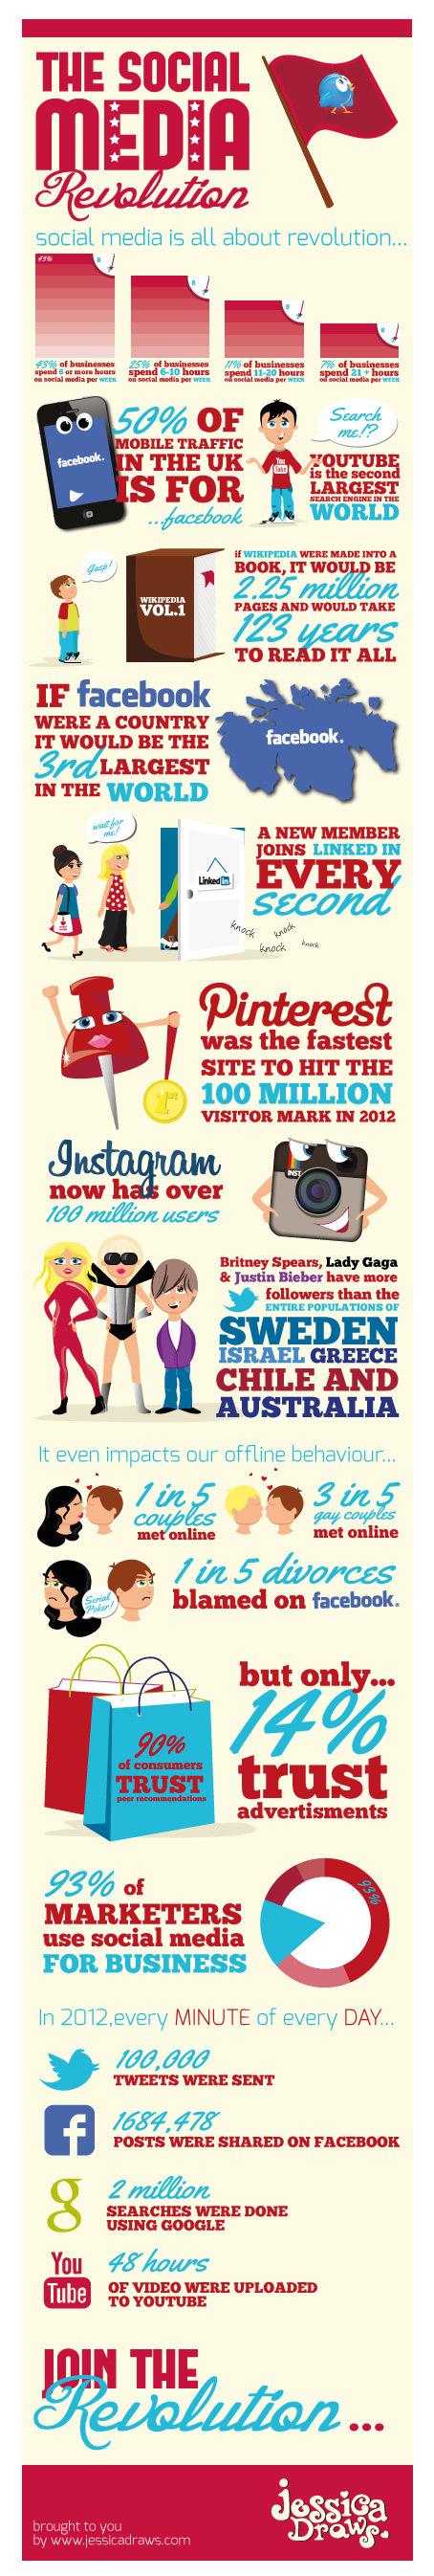 Social Media is all about Revolution #infographic - http://hosting.ber-art.nl/social-media-revolution /@BerriePelser   #EAv (e)LOCRIS - Is Empire Avenue worth it?   Scoop.it